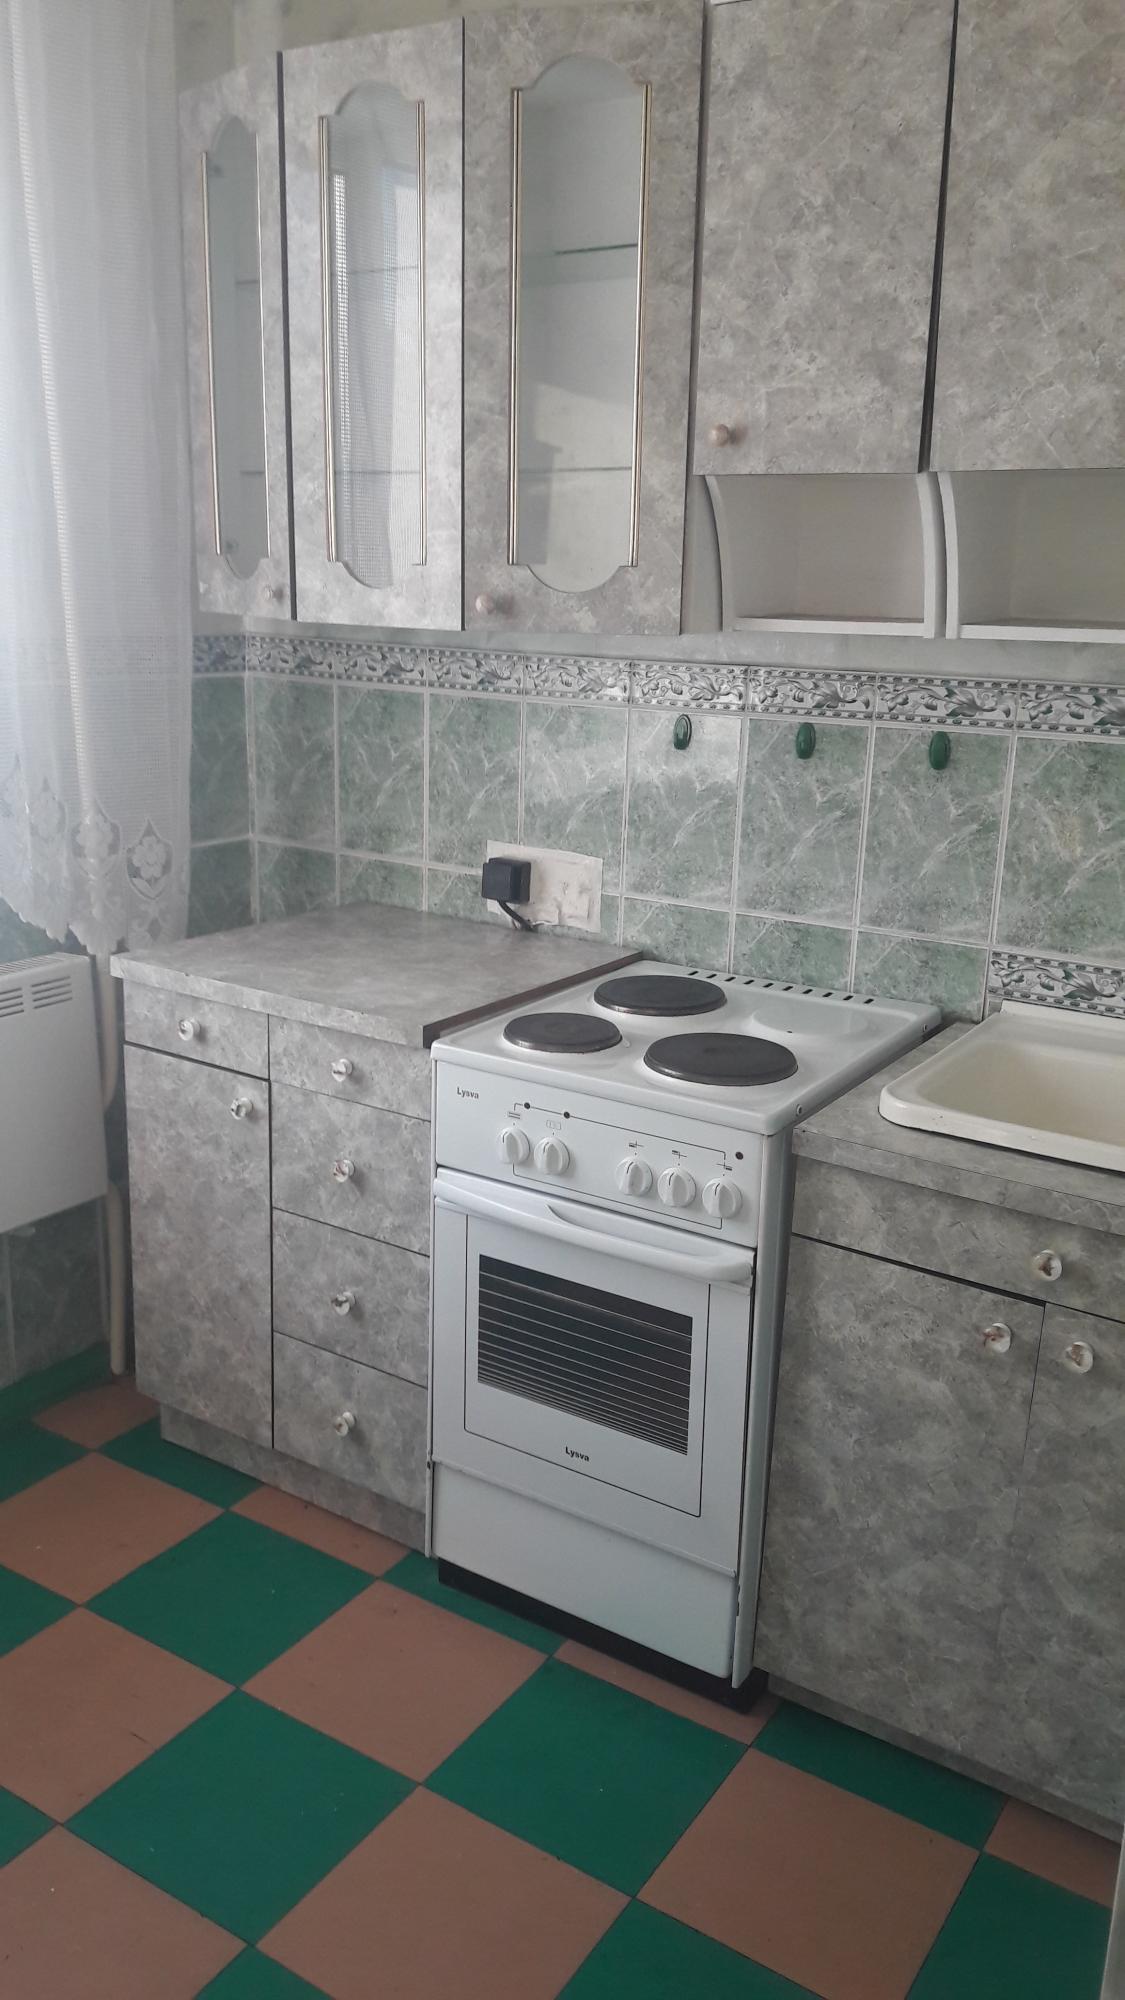 1к квартира Судостроительная улица, 117 | 12000 | аренда в Красноярске фото 3